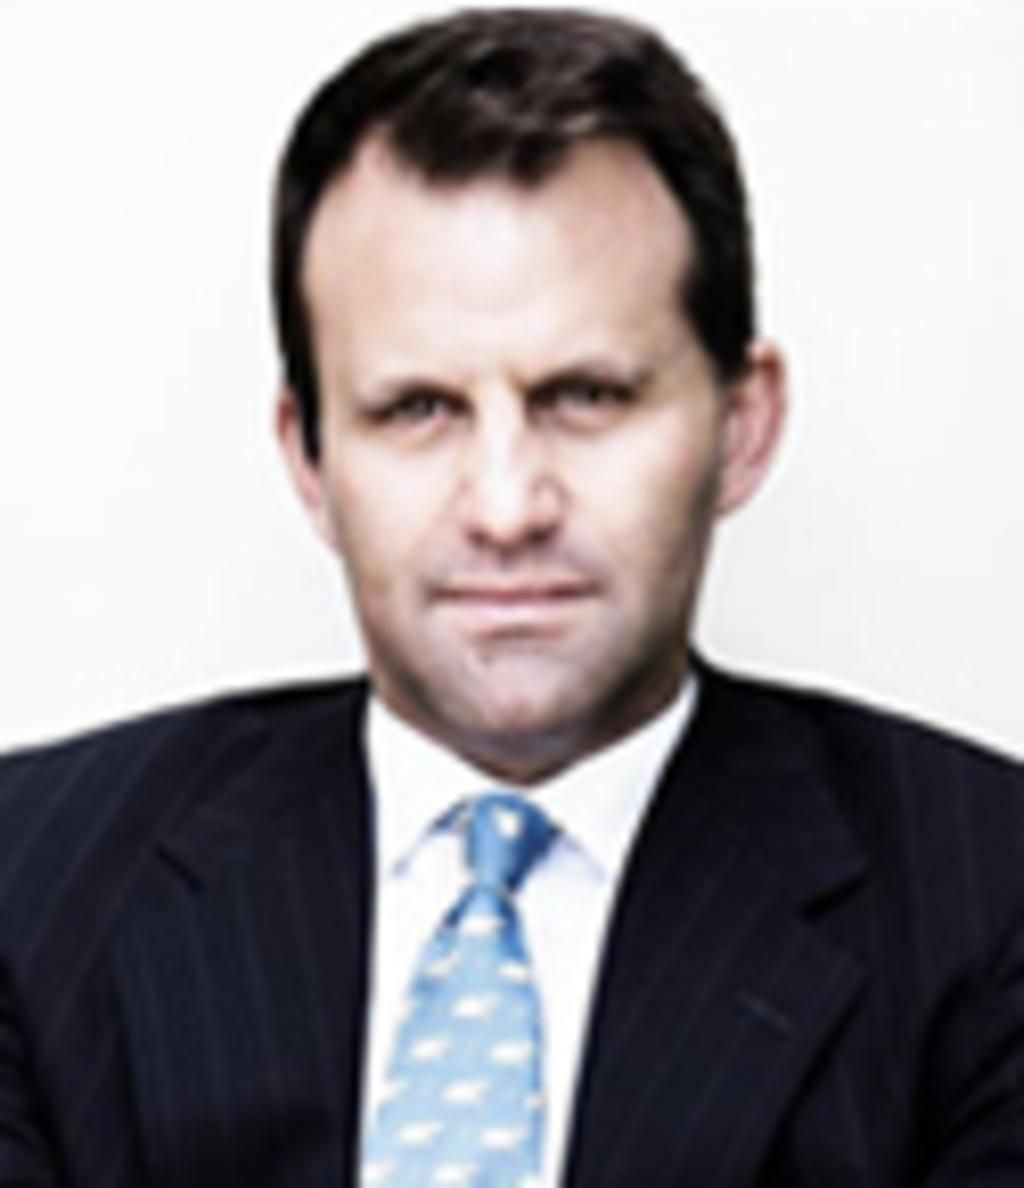 Harrison Barnes Attorney at law, Harrison barnes, Law firm